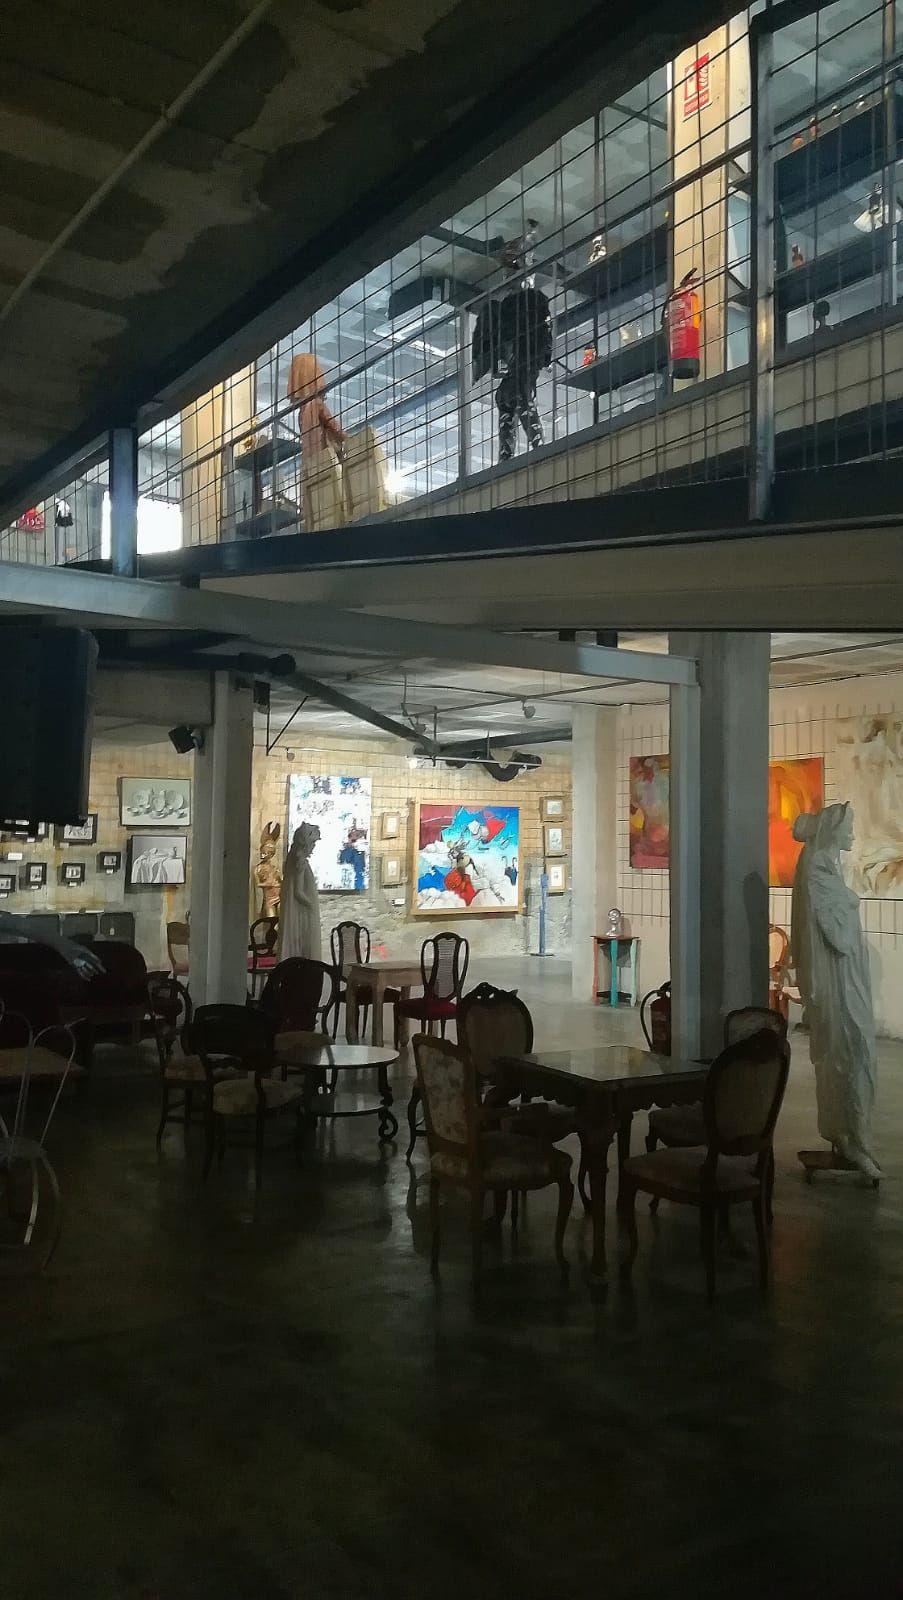 Alquiler de sala de eventos en Sitges